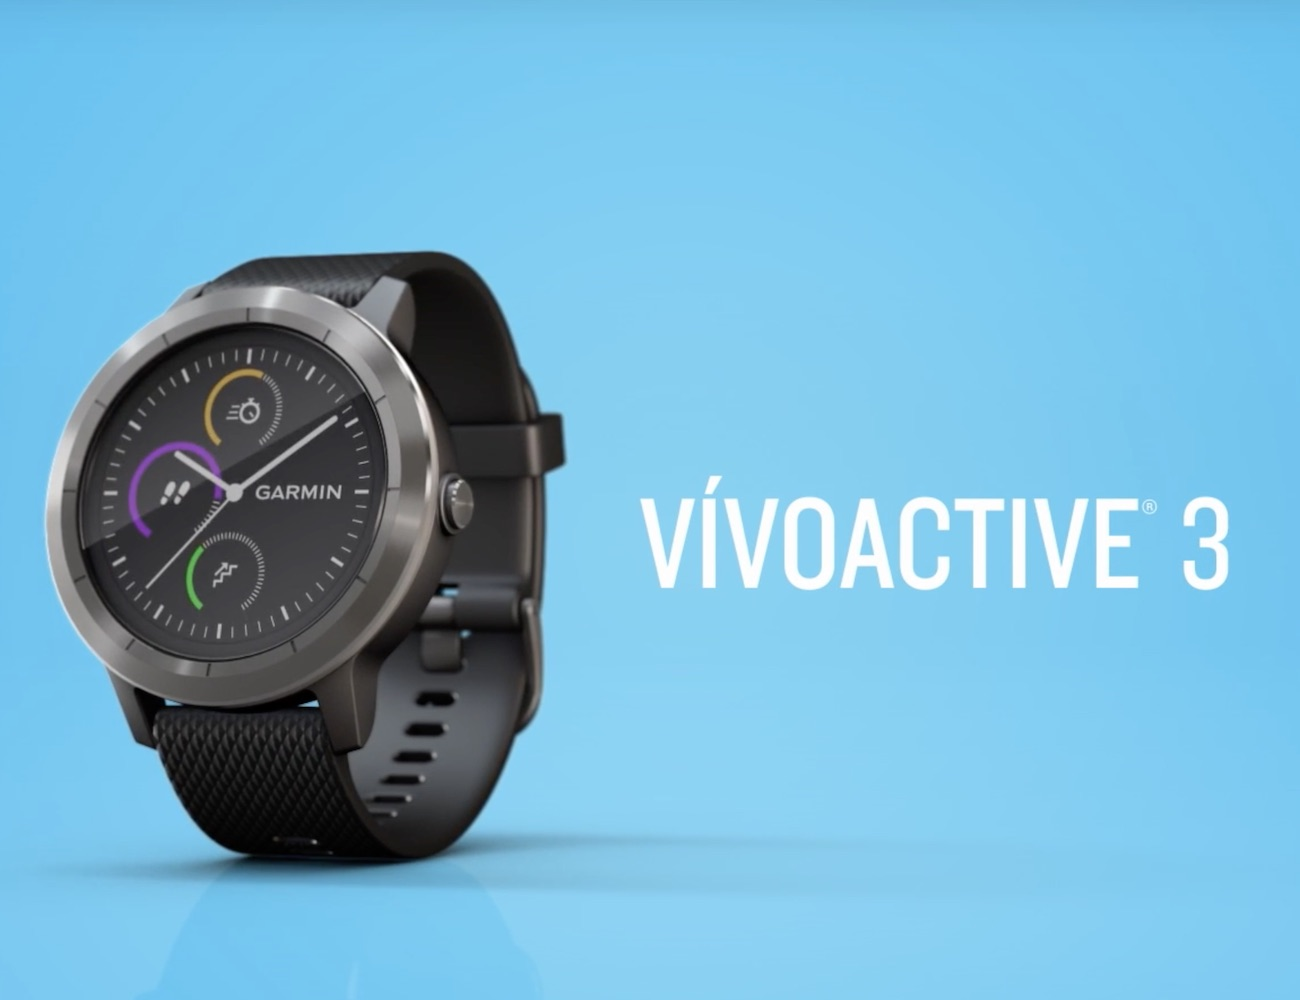 garmin vivoactive 3 smartwatch gadget flow. Black Bedroom Furniture Sets. Home Design Ideas